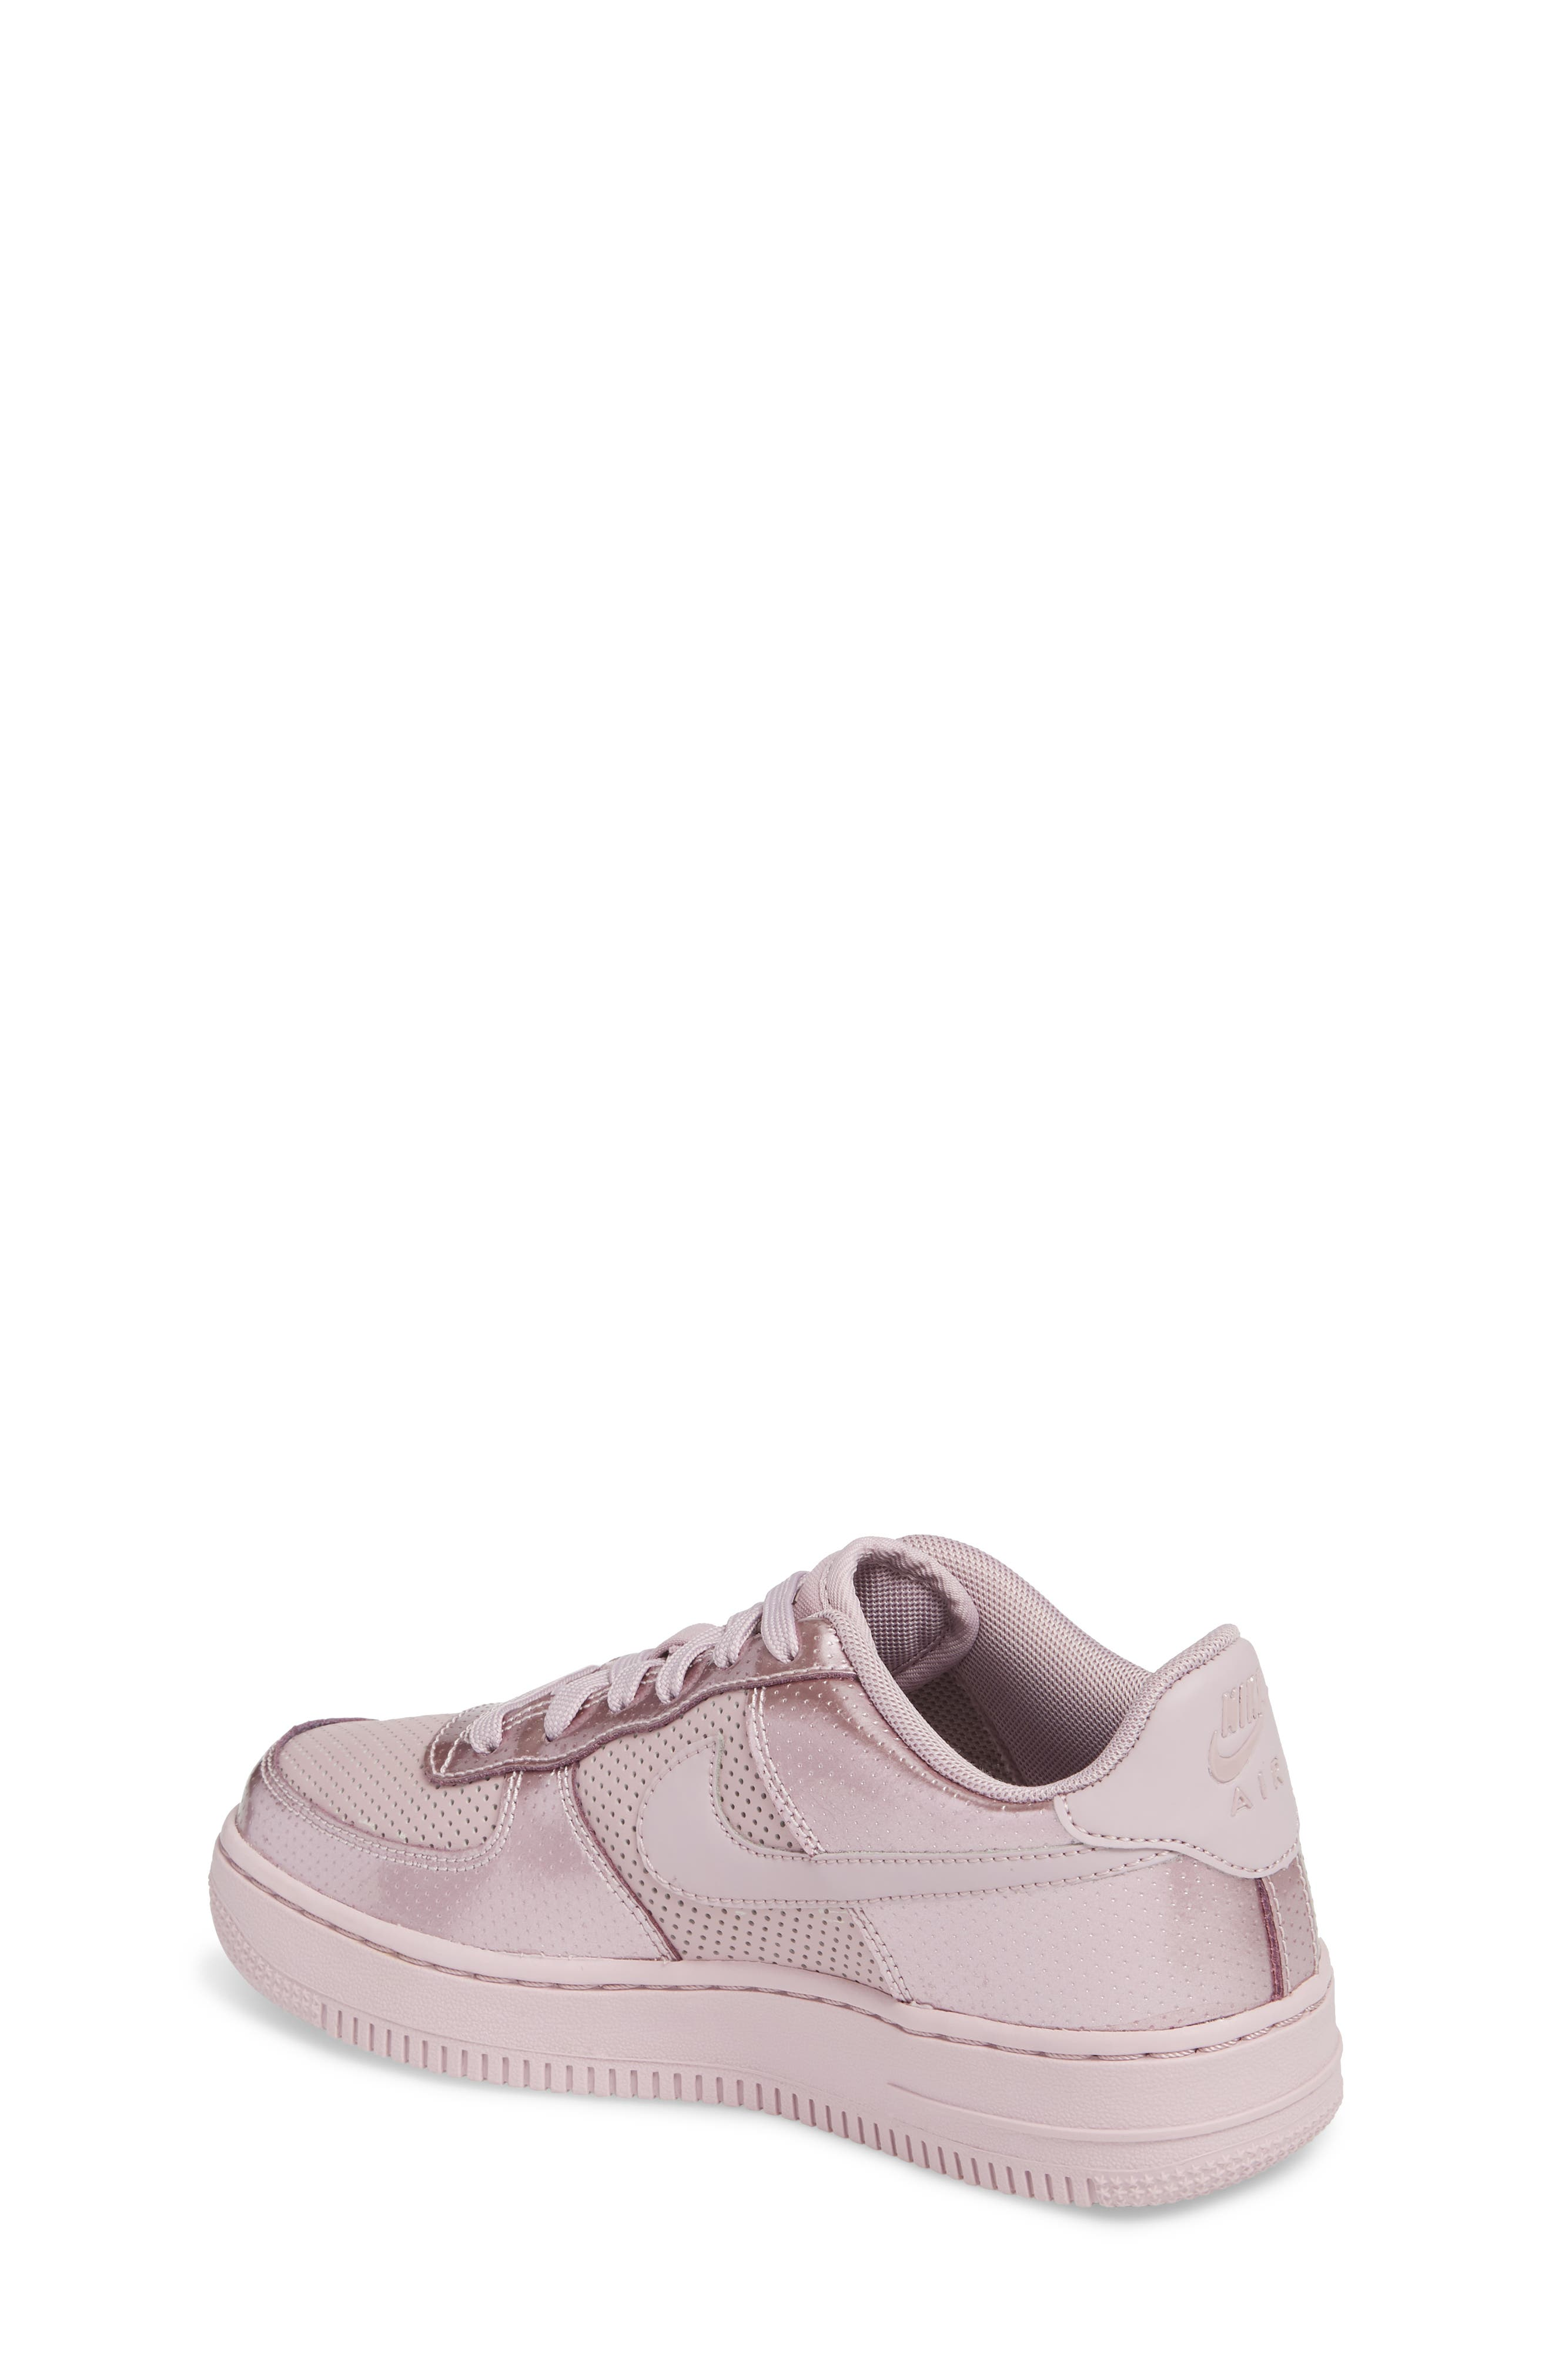 Air Force 1 LV8 Sneaker,                             Alternate thumbnail 9, color,